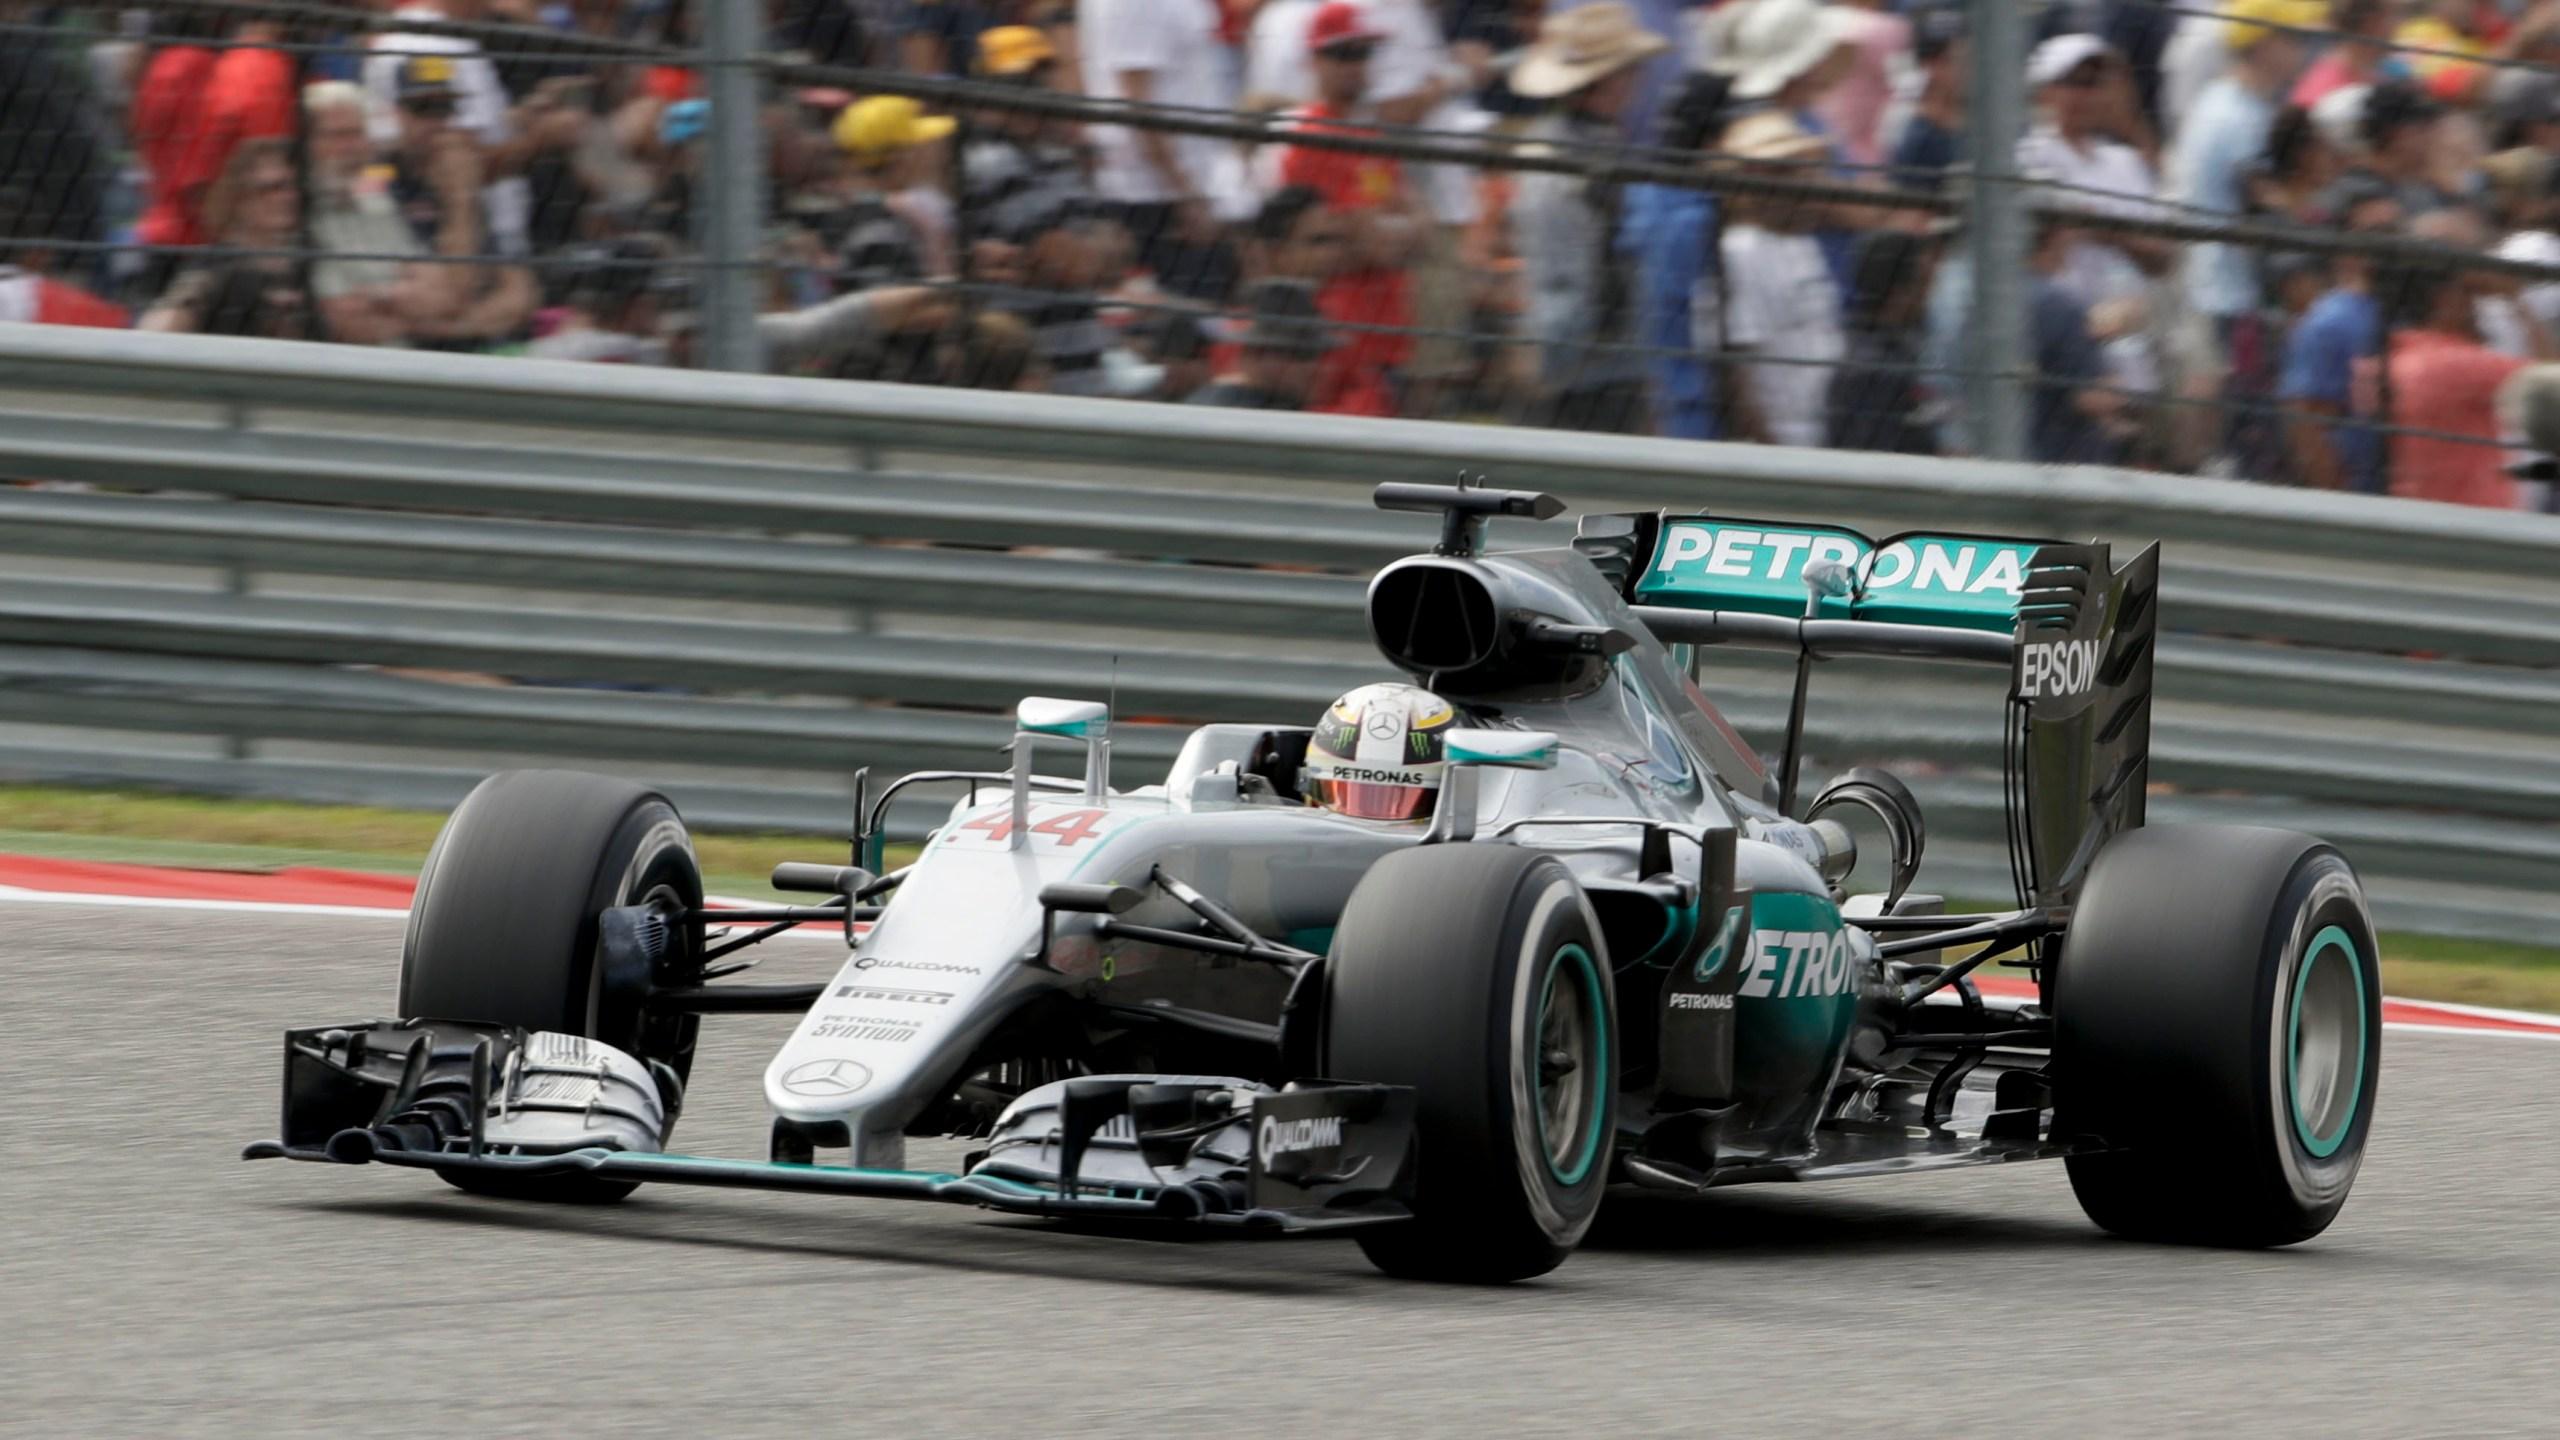 F1 US Grand Prix Auto Racing_365251